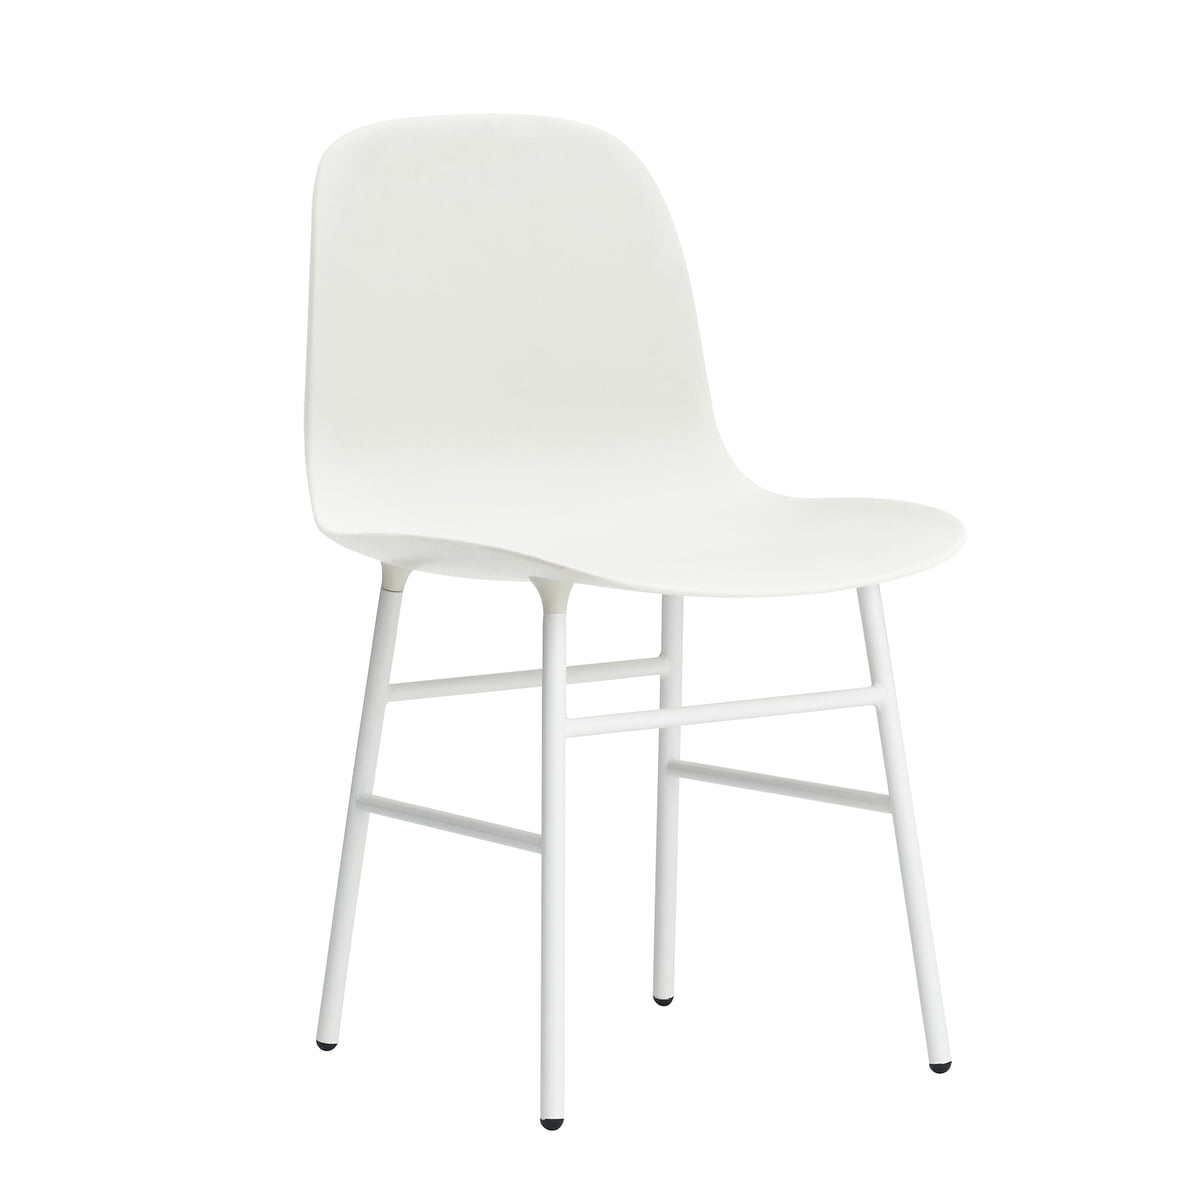 Form chair white steel legs